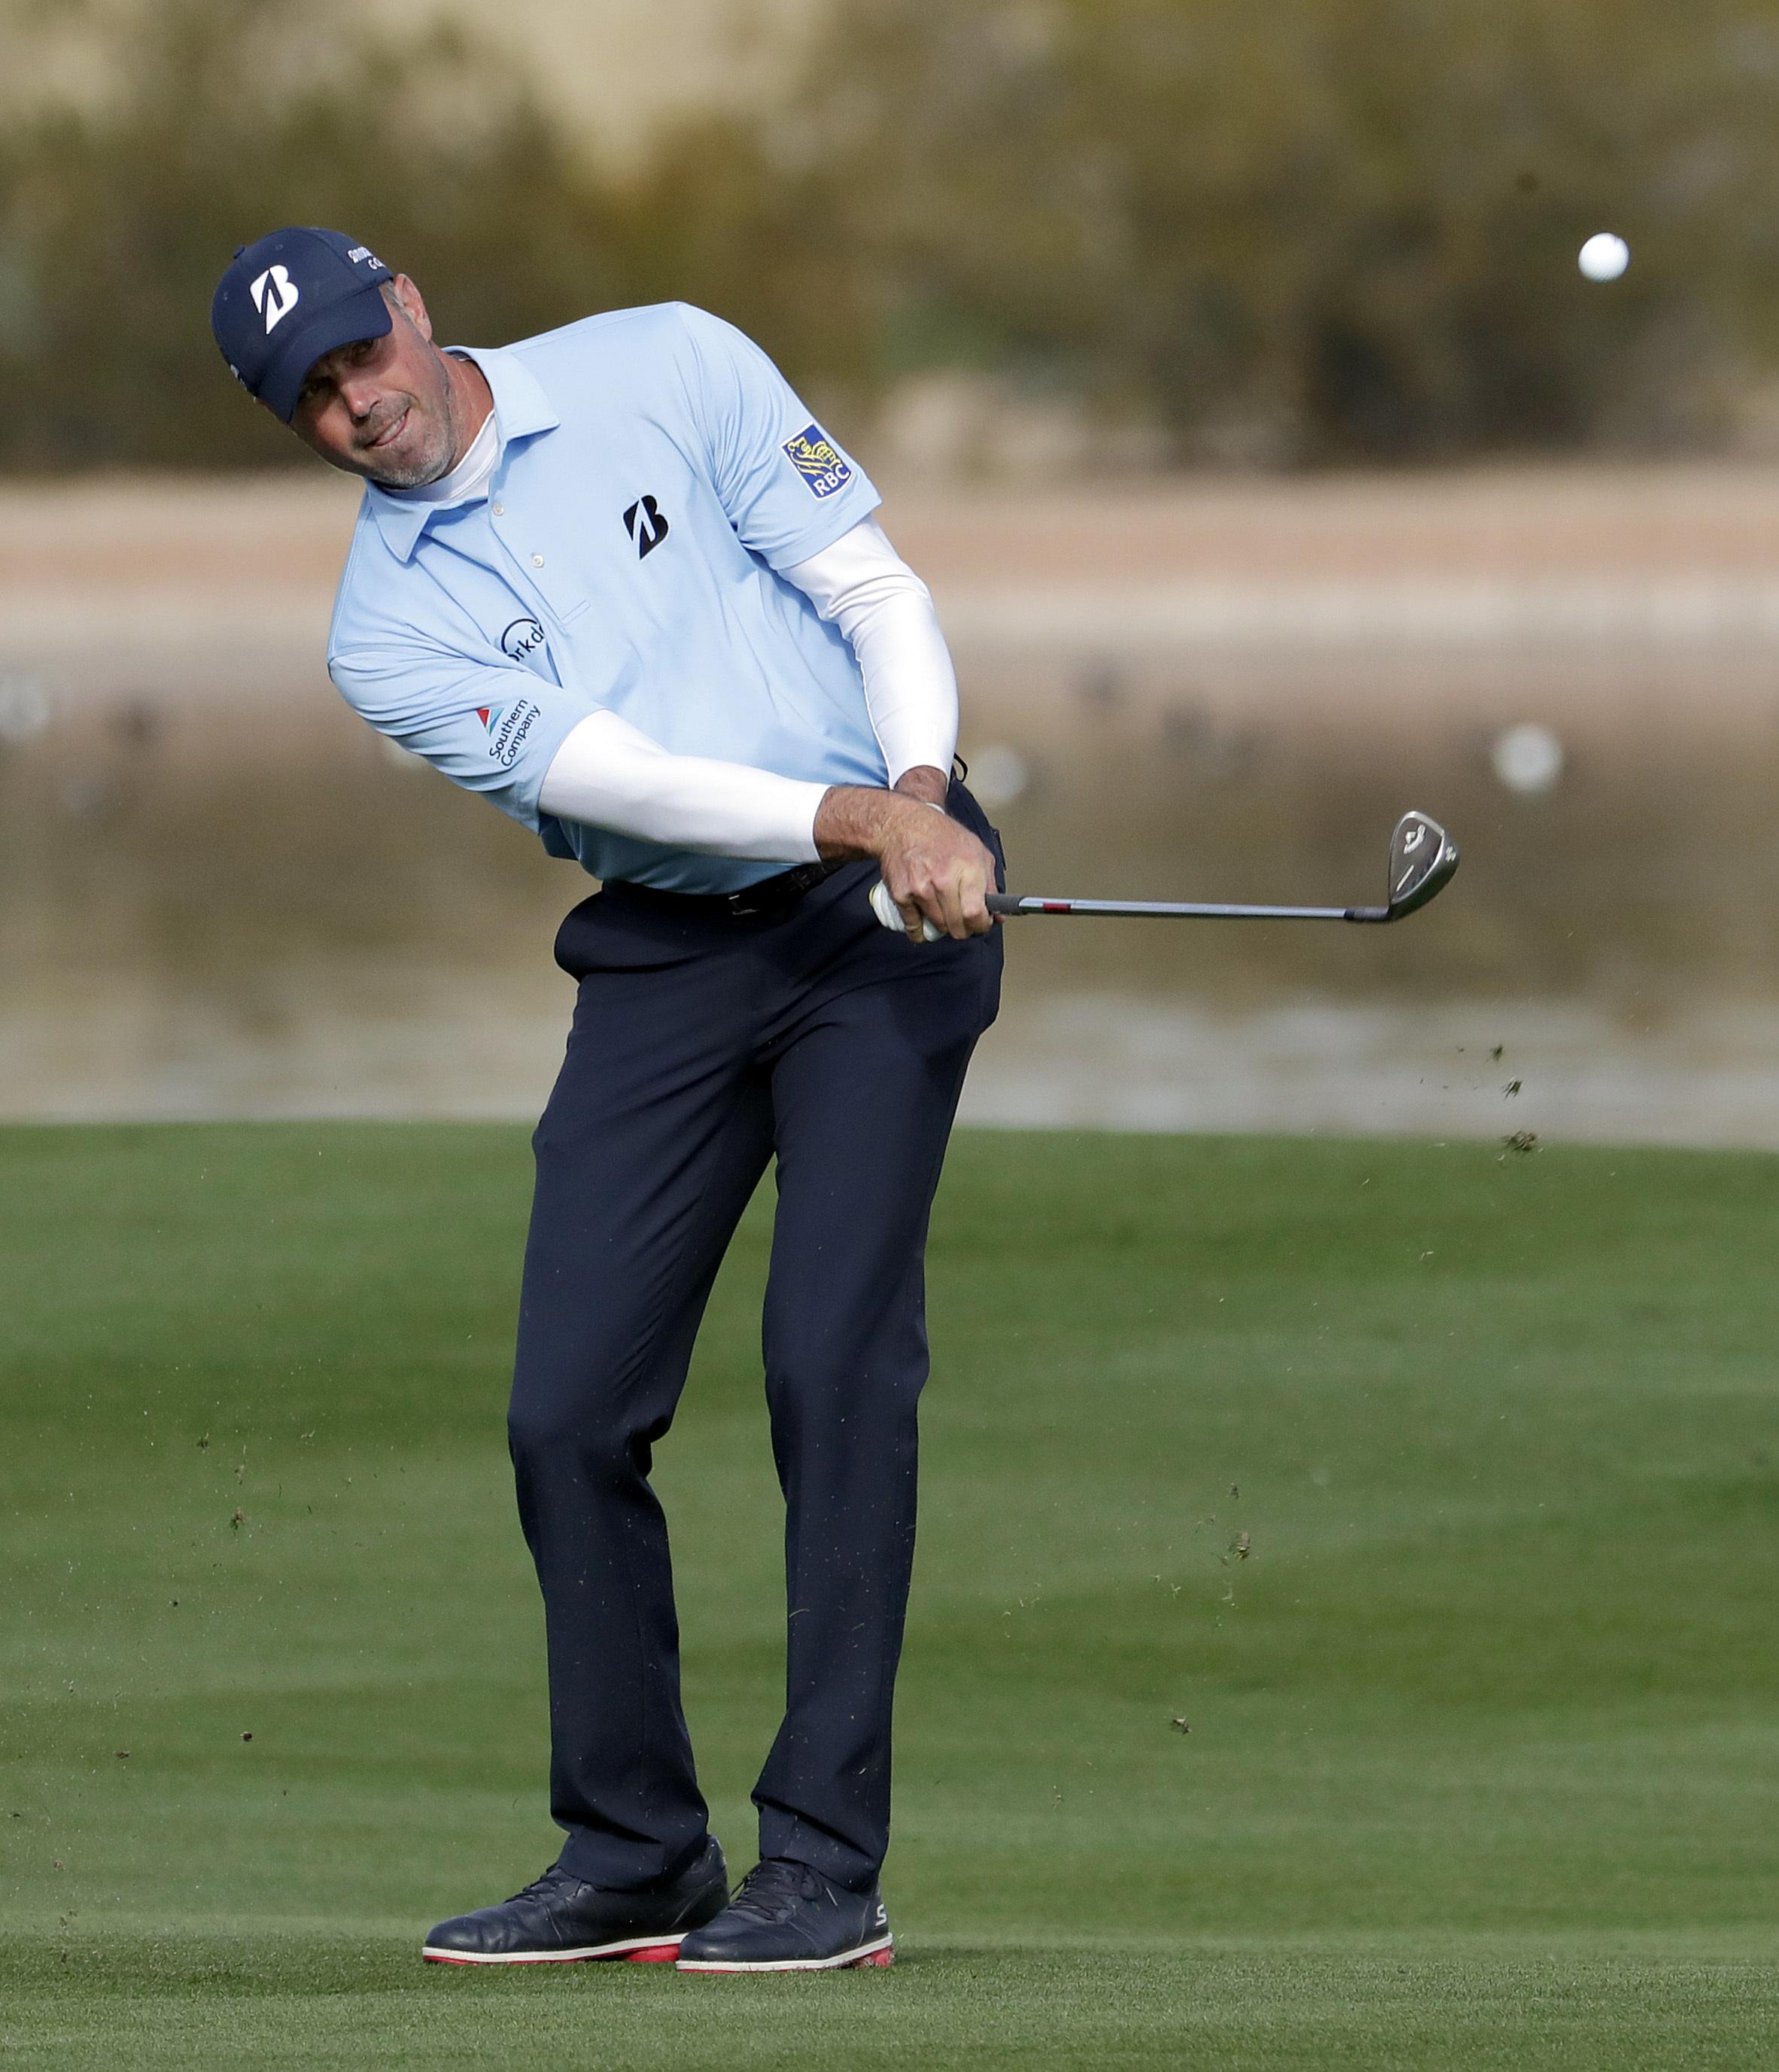 Matt Kucher hits his second shot from the 15th fairway during the second round of the Phoenix Open golf tournament, Friday, Feb. 3, 2017, in Scottsdale, Ariz. (AP Photo/Matt York)